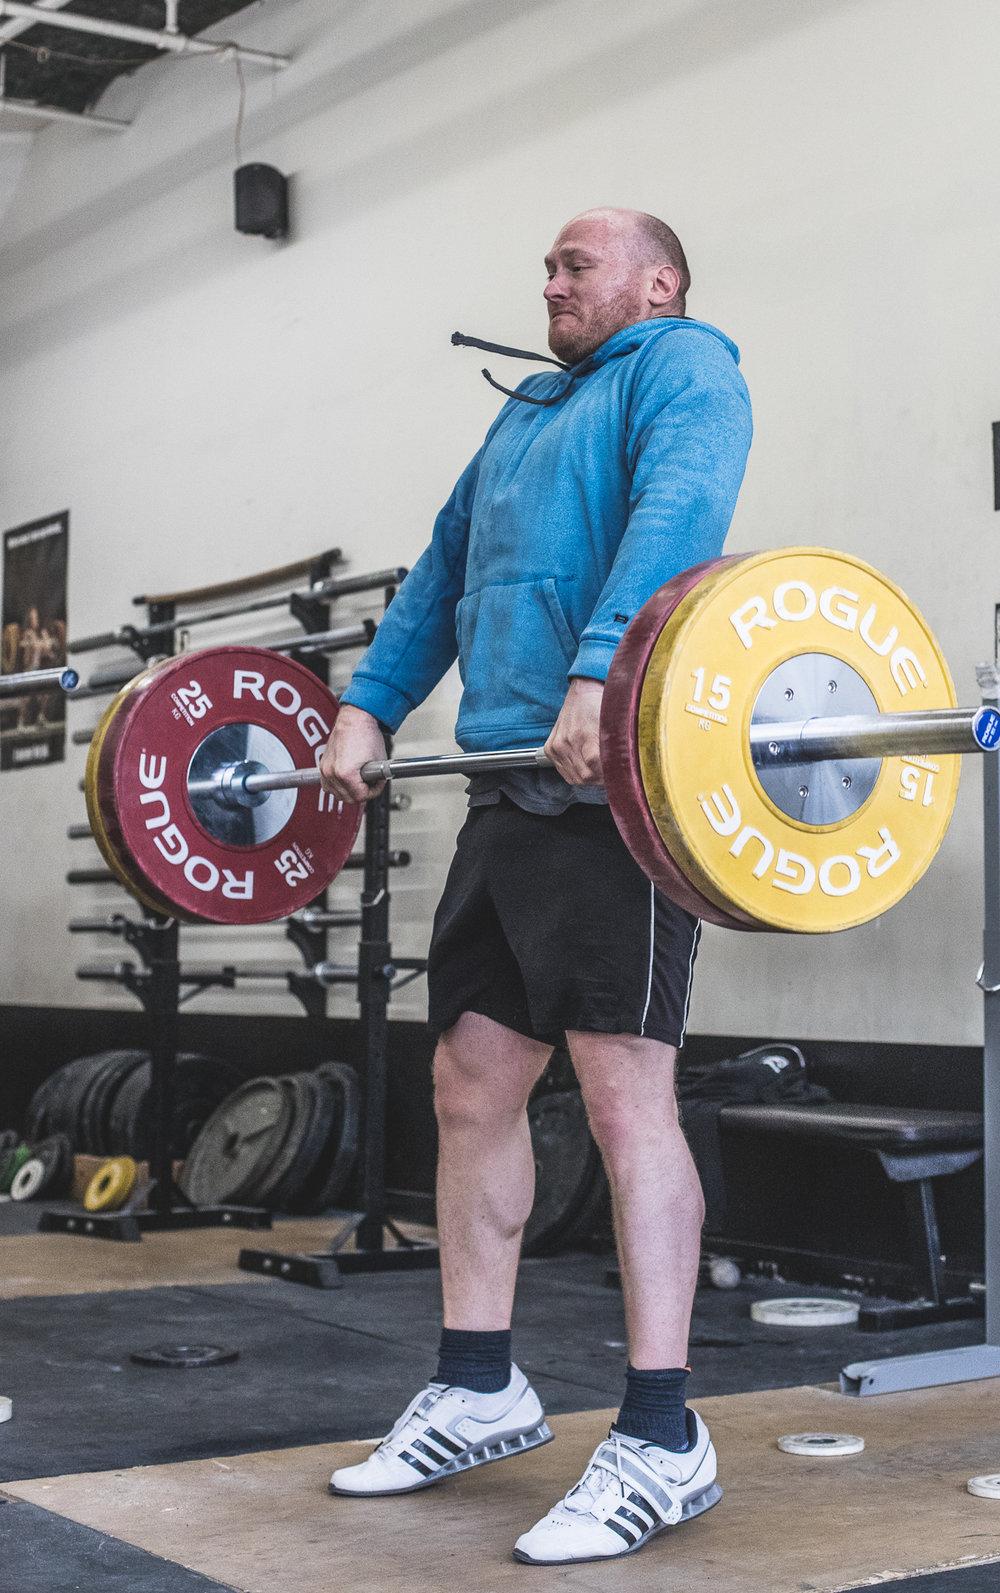 yasha-kahn-weightlifting-coach-14.jpg